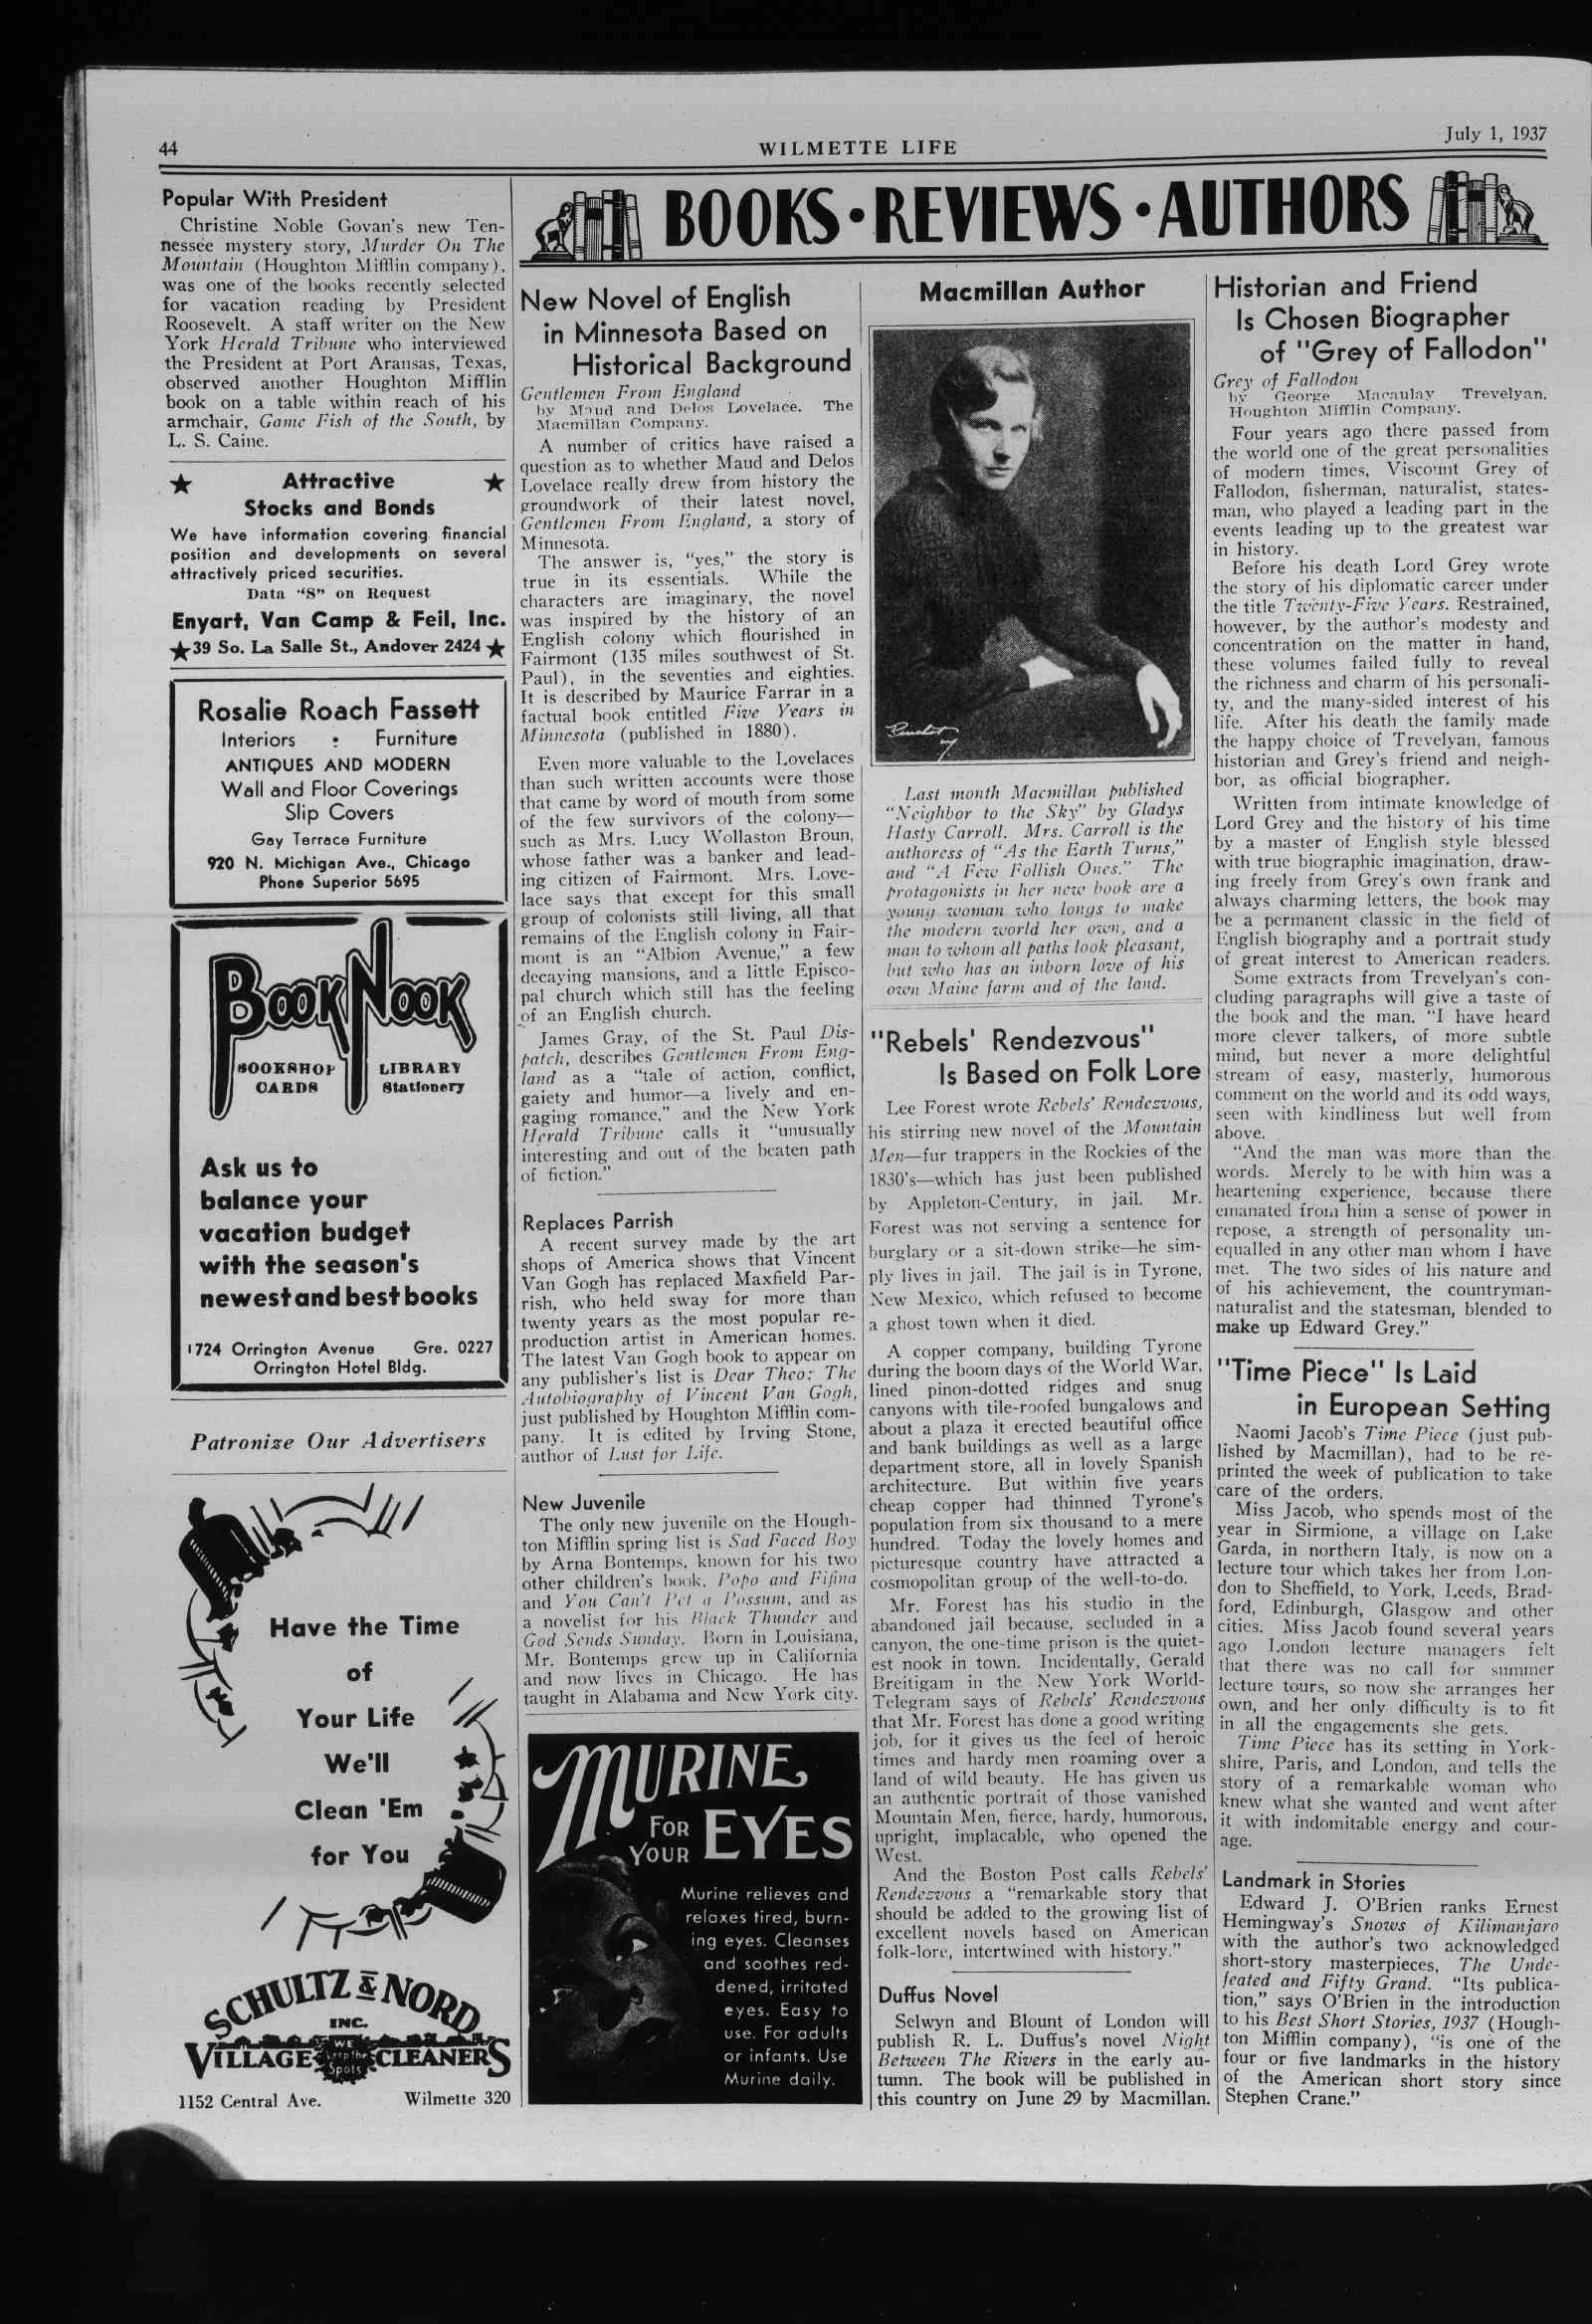 Wilmette Life (Wilmette, Illinois), 1 Jul 1937